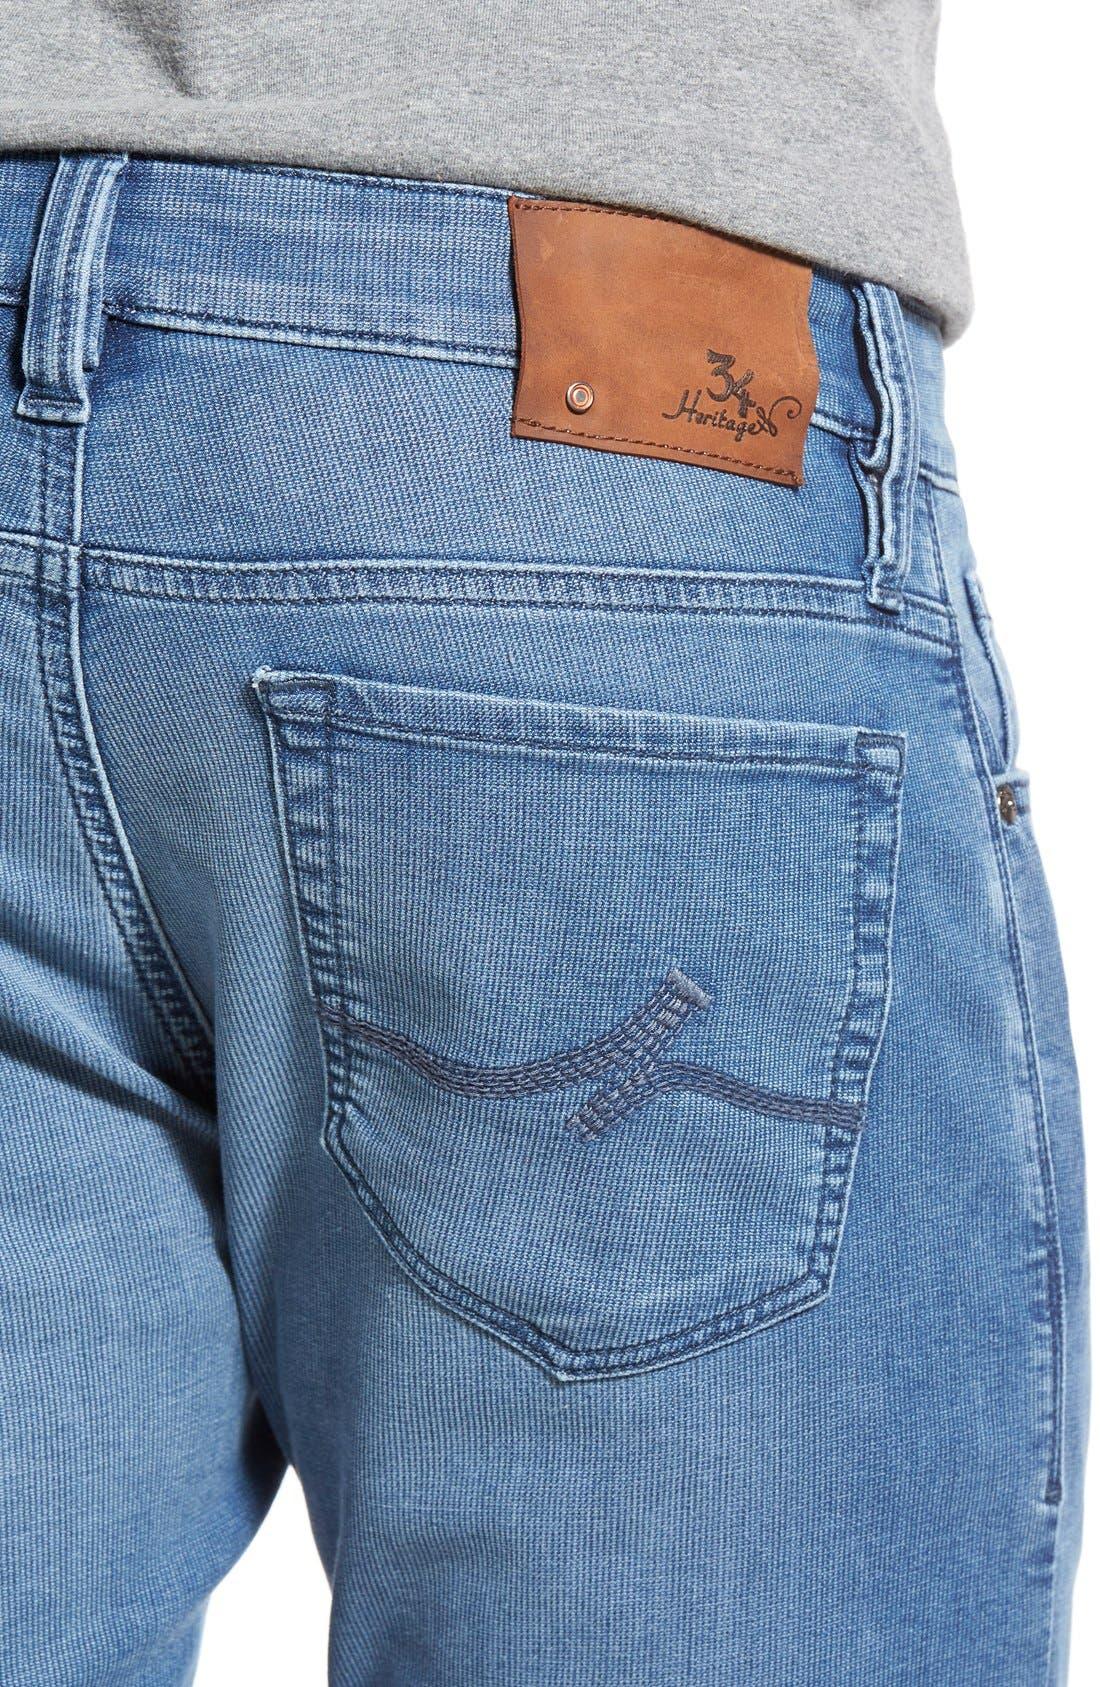 34 HERITAGE,                             'Courage' Straight Leg Jeans,                             Alternate thumbnail 2, color,                             LIGHT INDIGO SPORTY